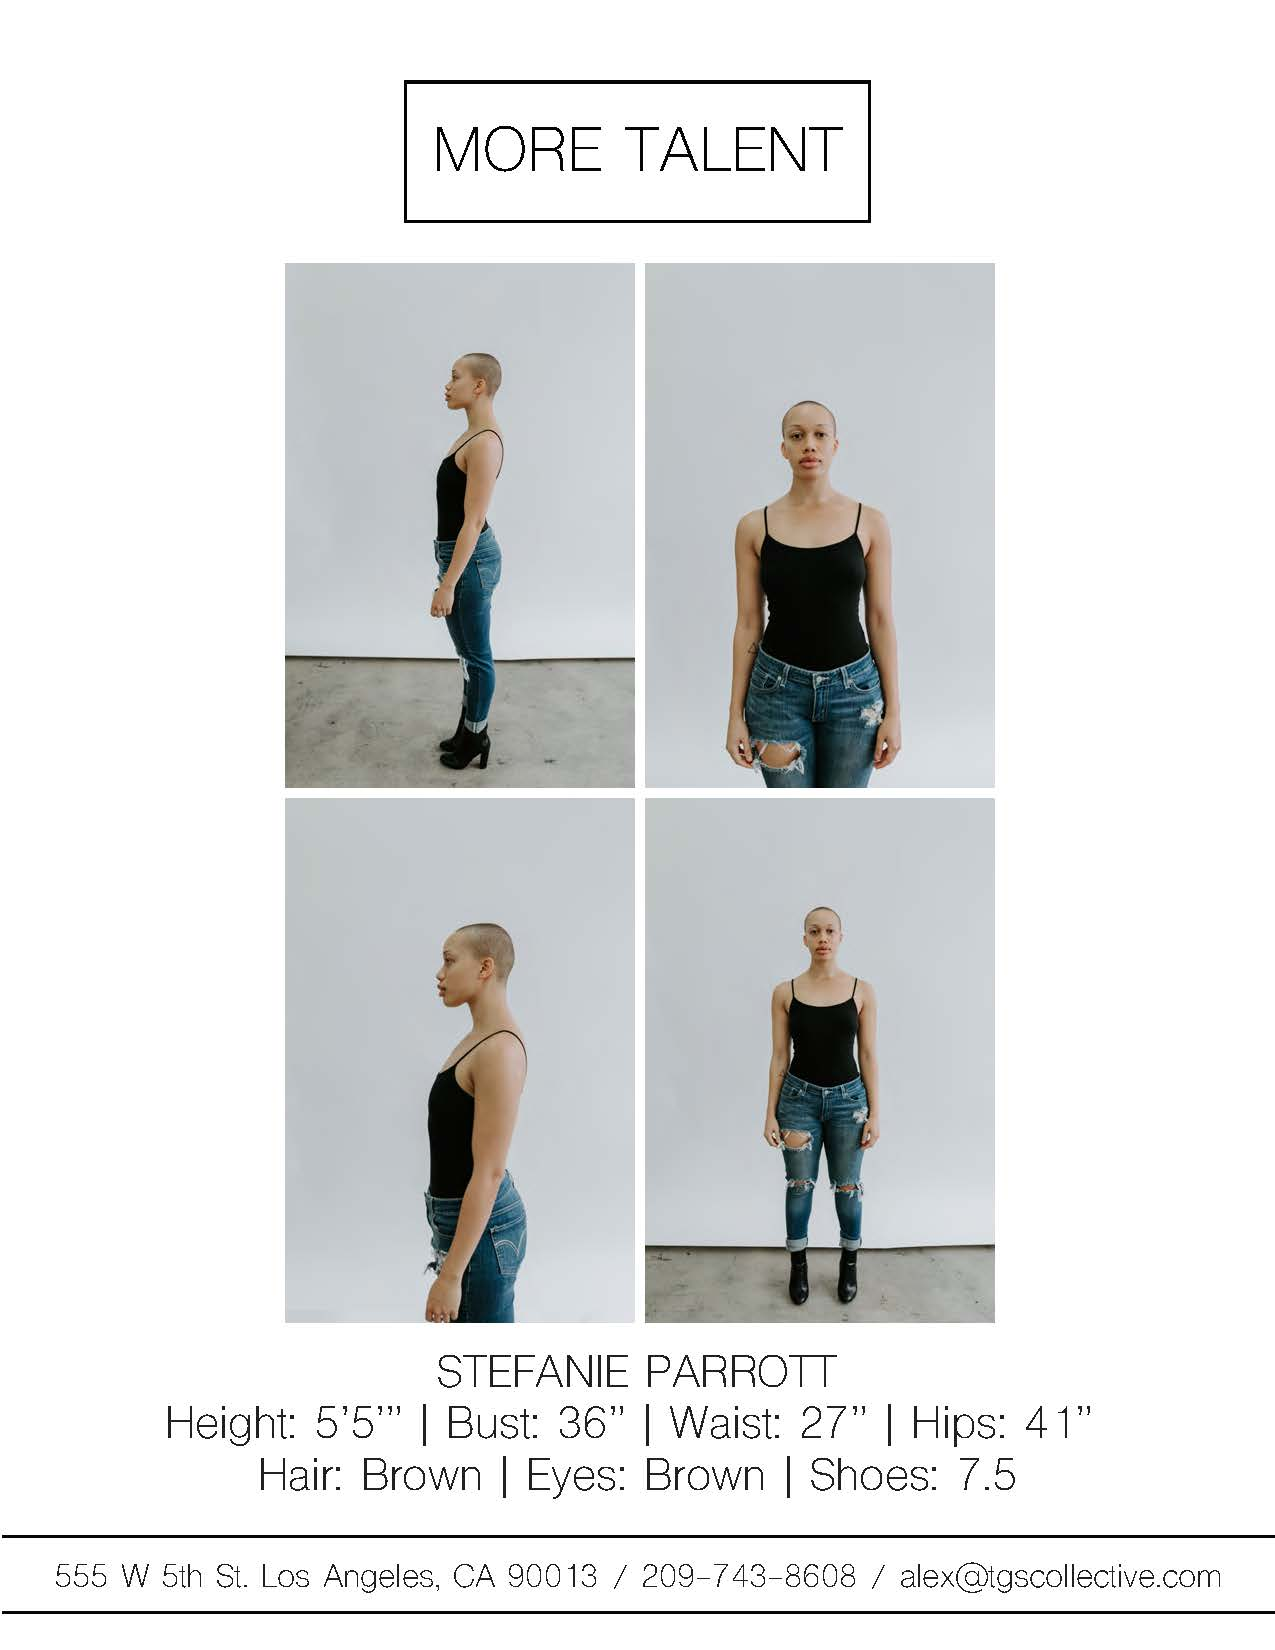 Stefanie Parrott MORE Talent.jpg